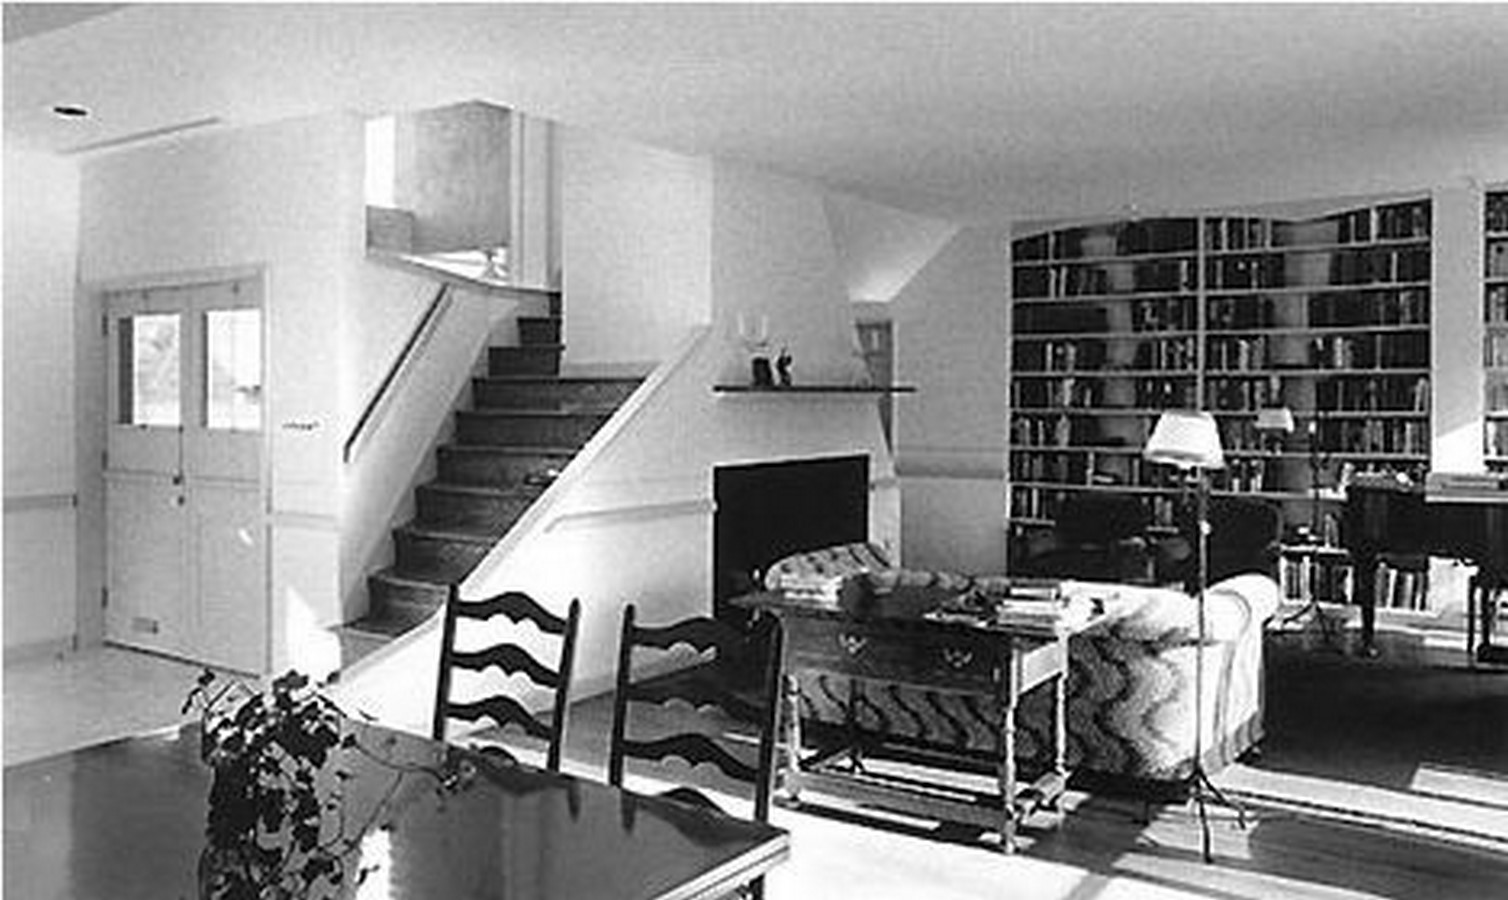 Vanna Venturi House, Pennsylvania, USA - SHeet2